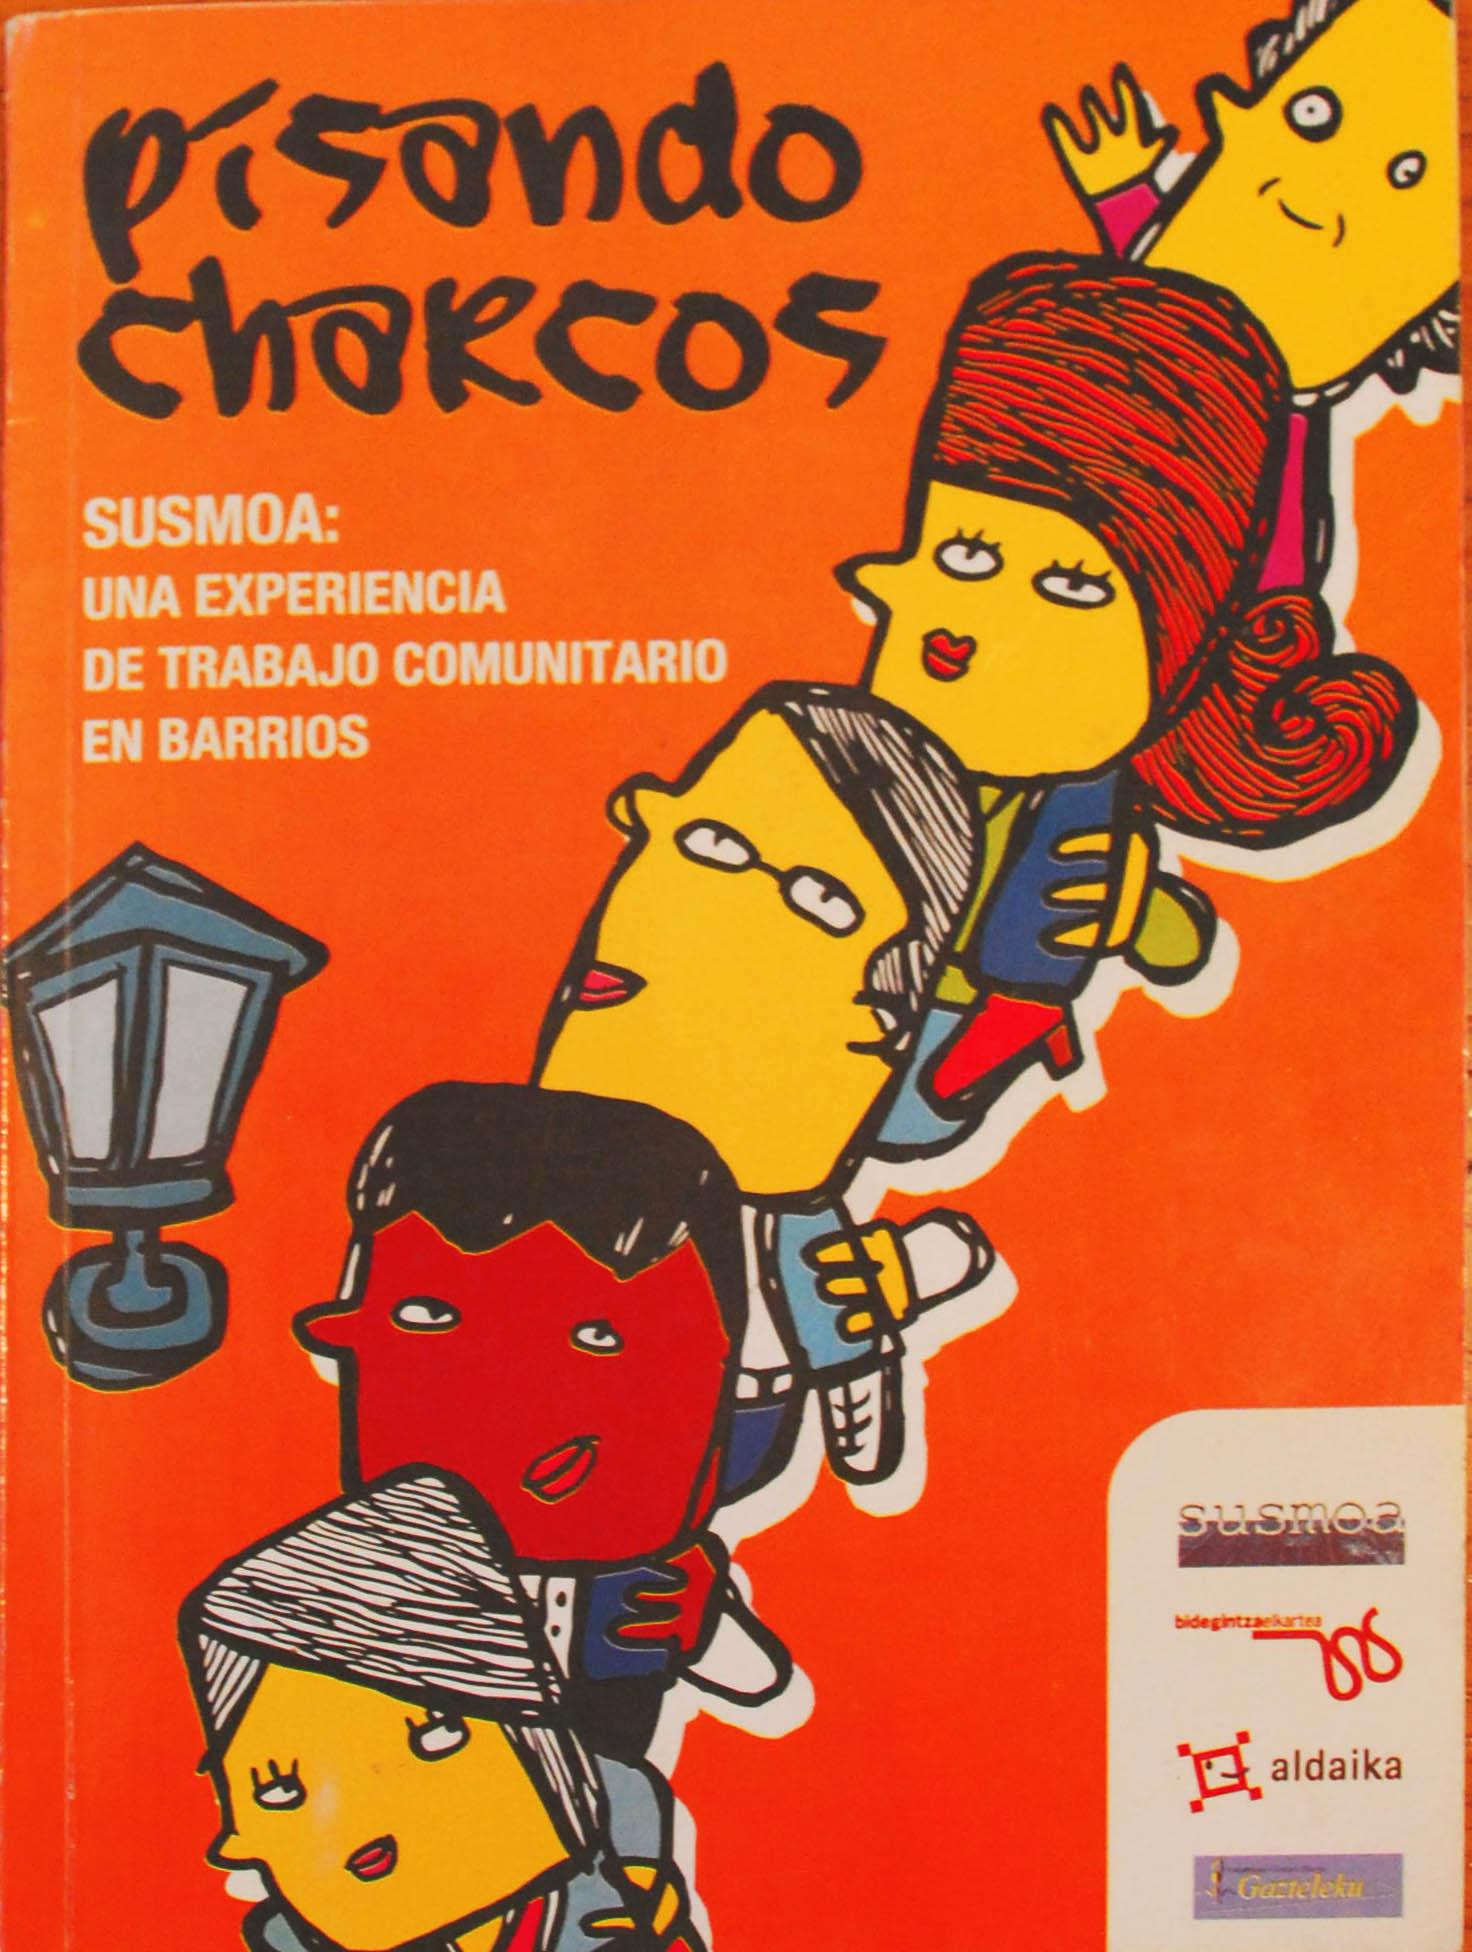 pisando_charcos